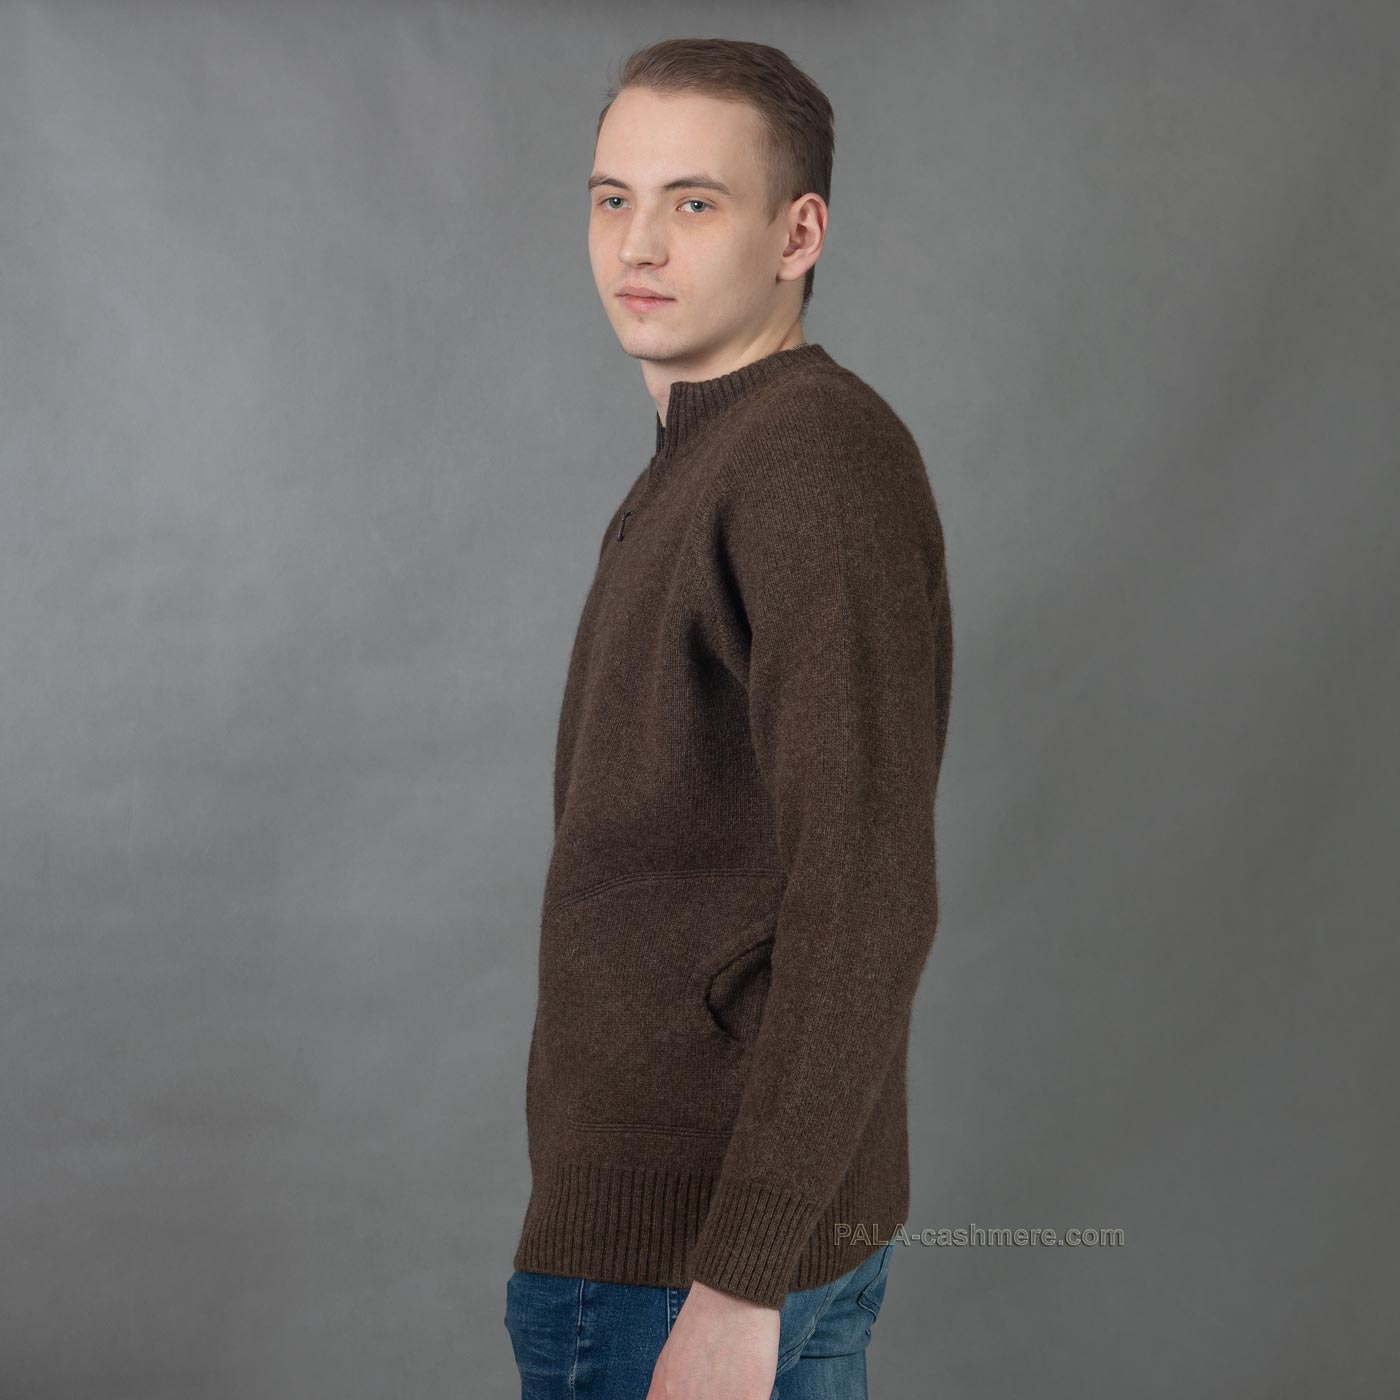 Джемпер на молнии из шерсти ягнят